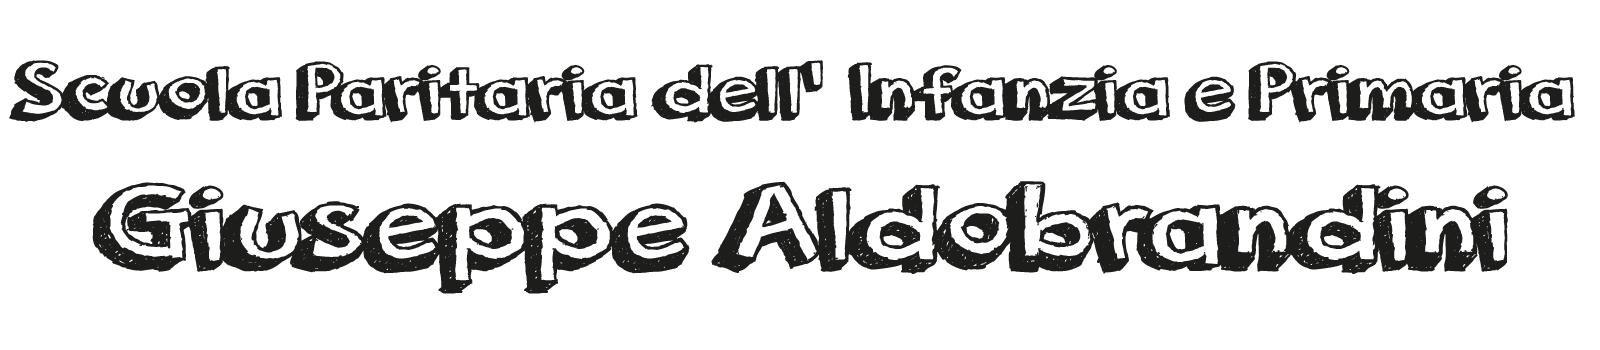 Scuola Paritaria Giuseppe Aldobrandini Logo